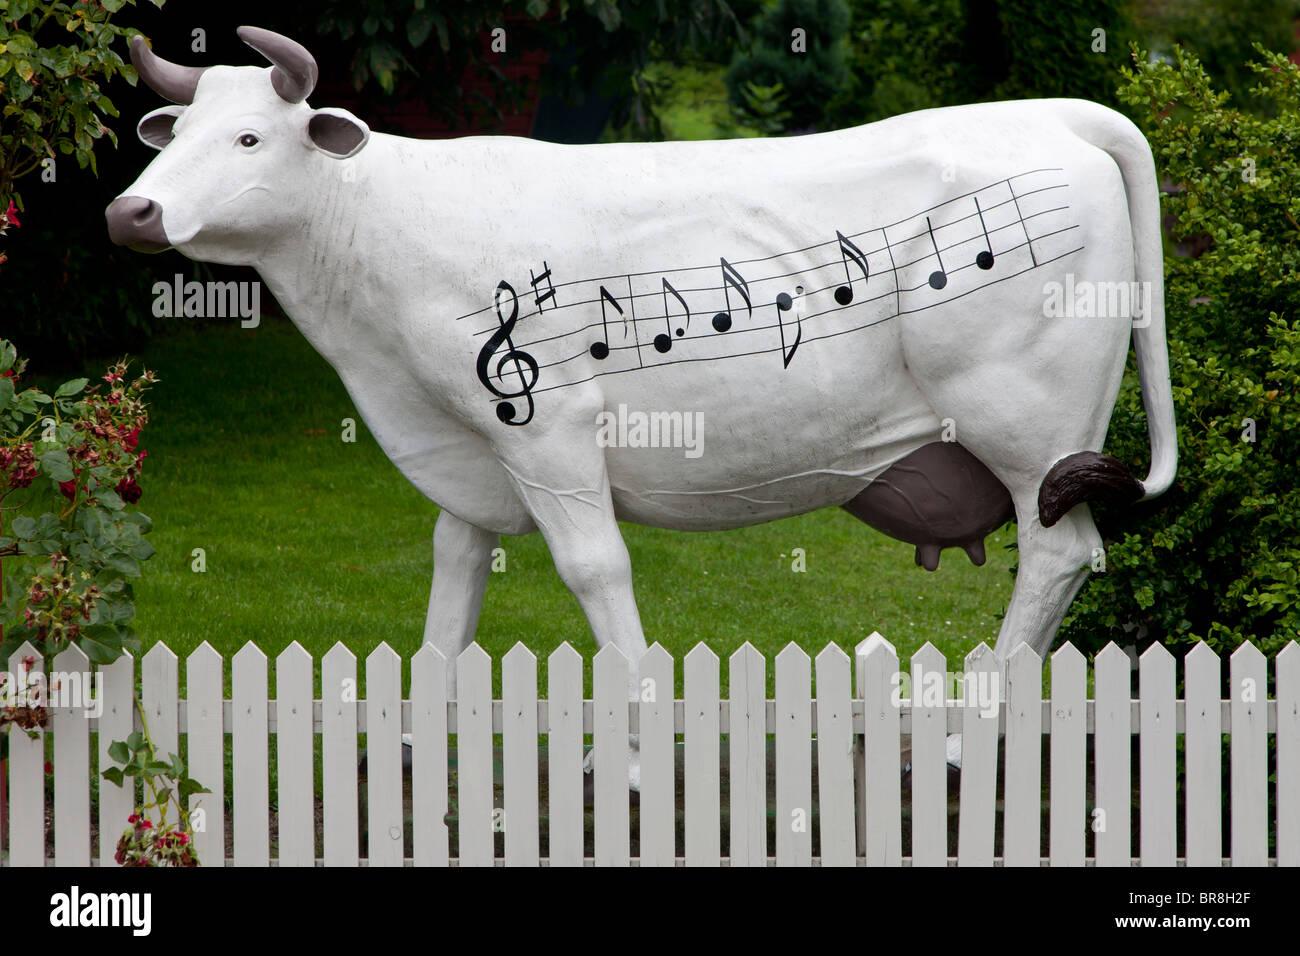 Musik-Kuh-Statue vor dem berühmten Brundby Rock Hotel auf Samsø-Dänemark Stockbild